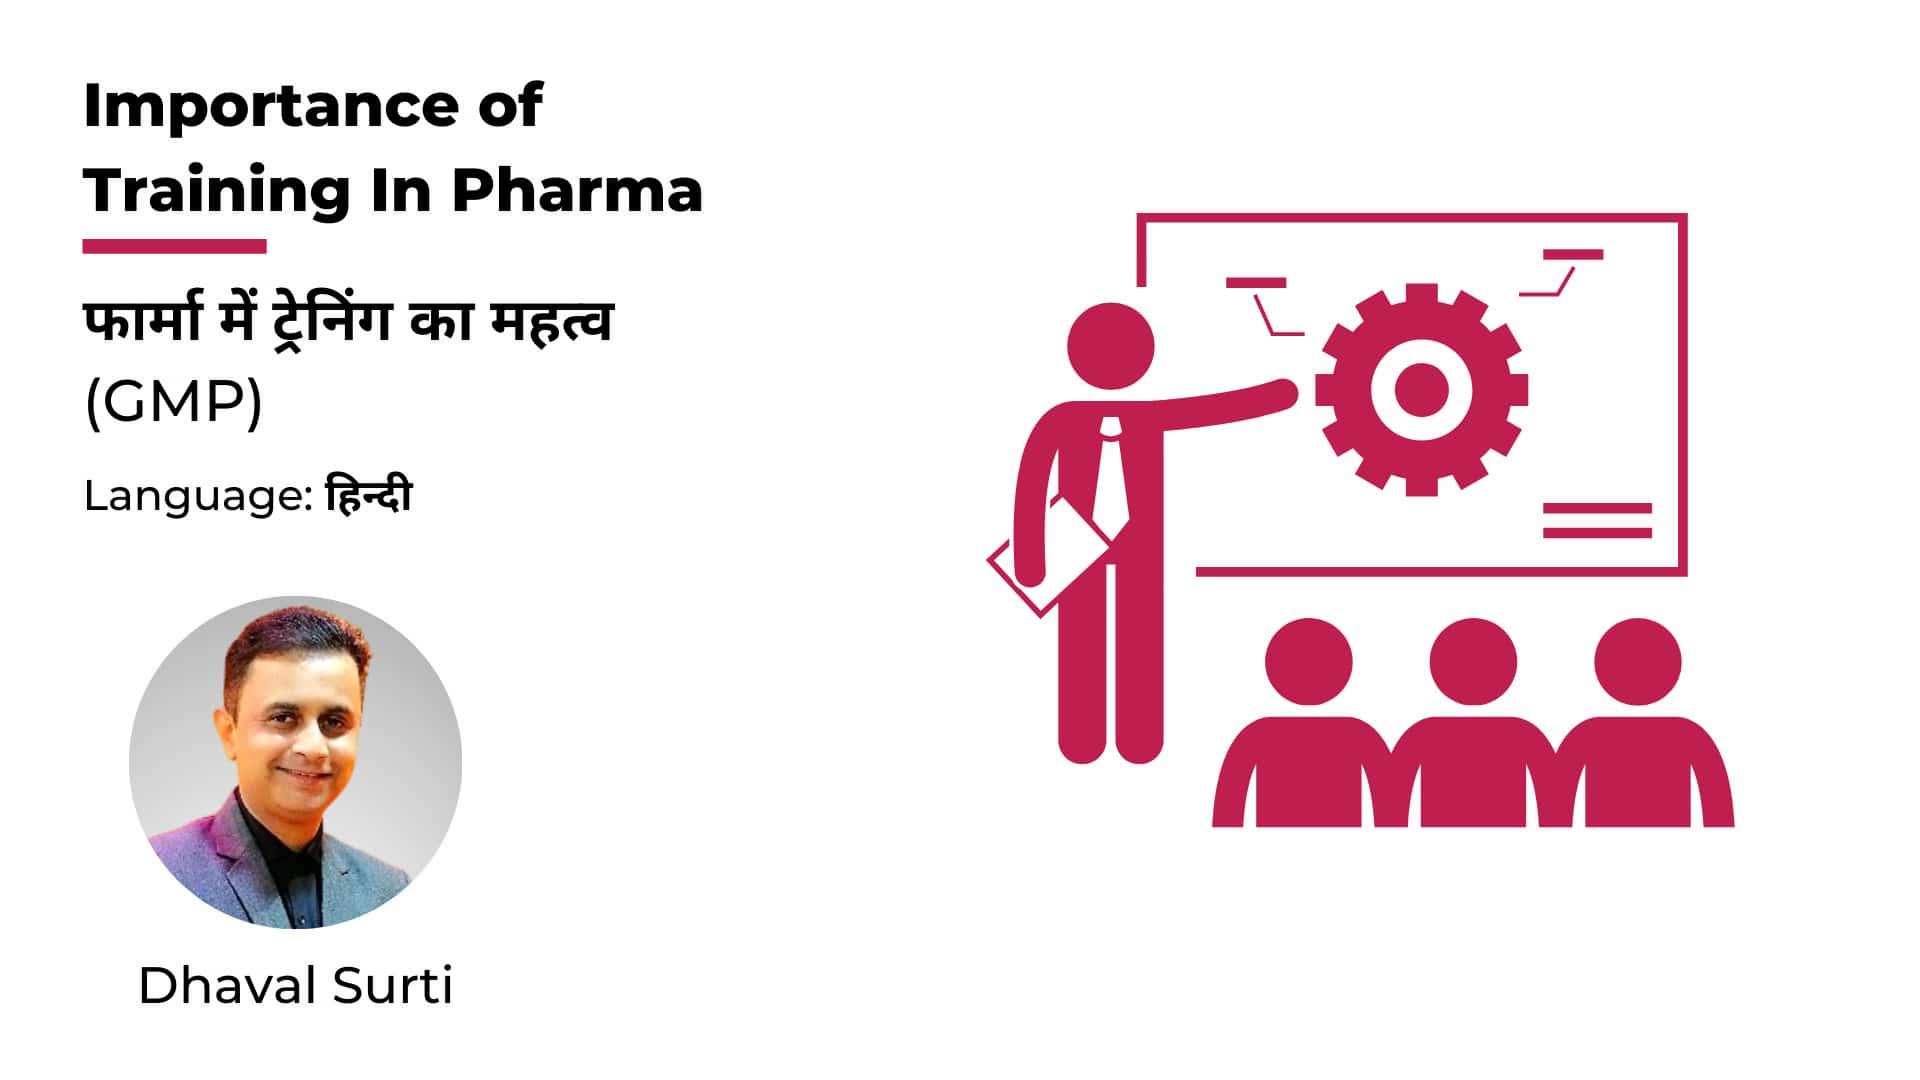 Training in Pharma